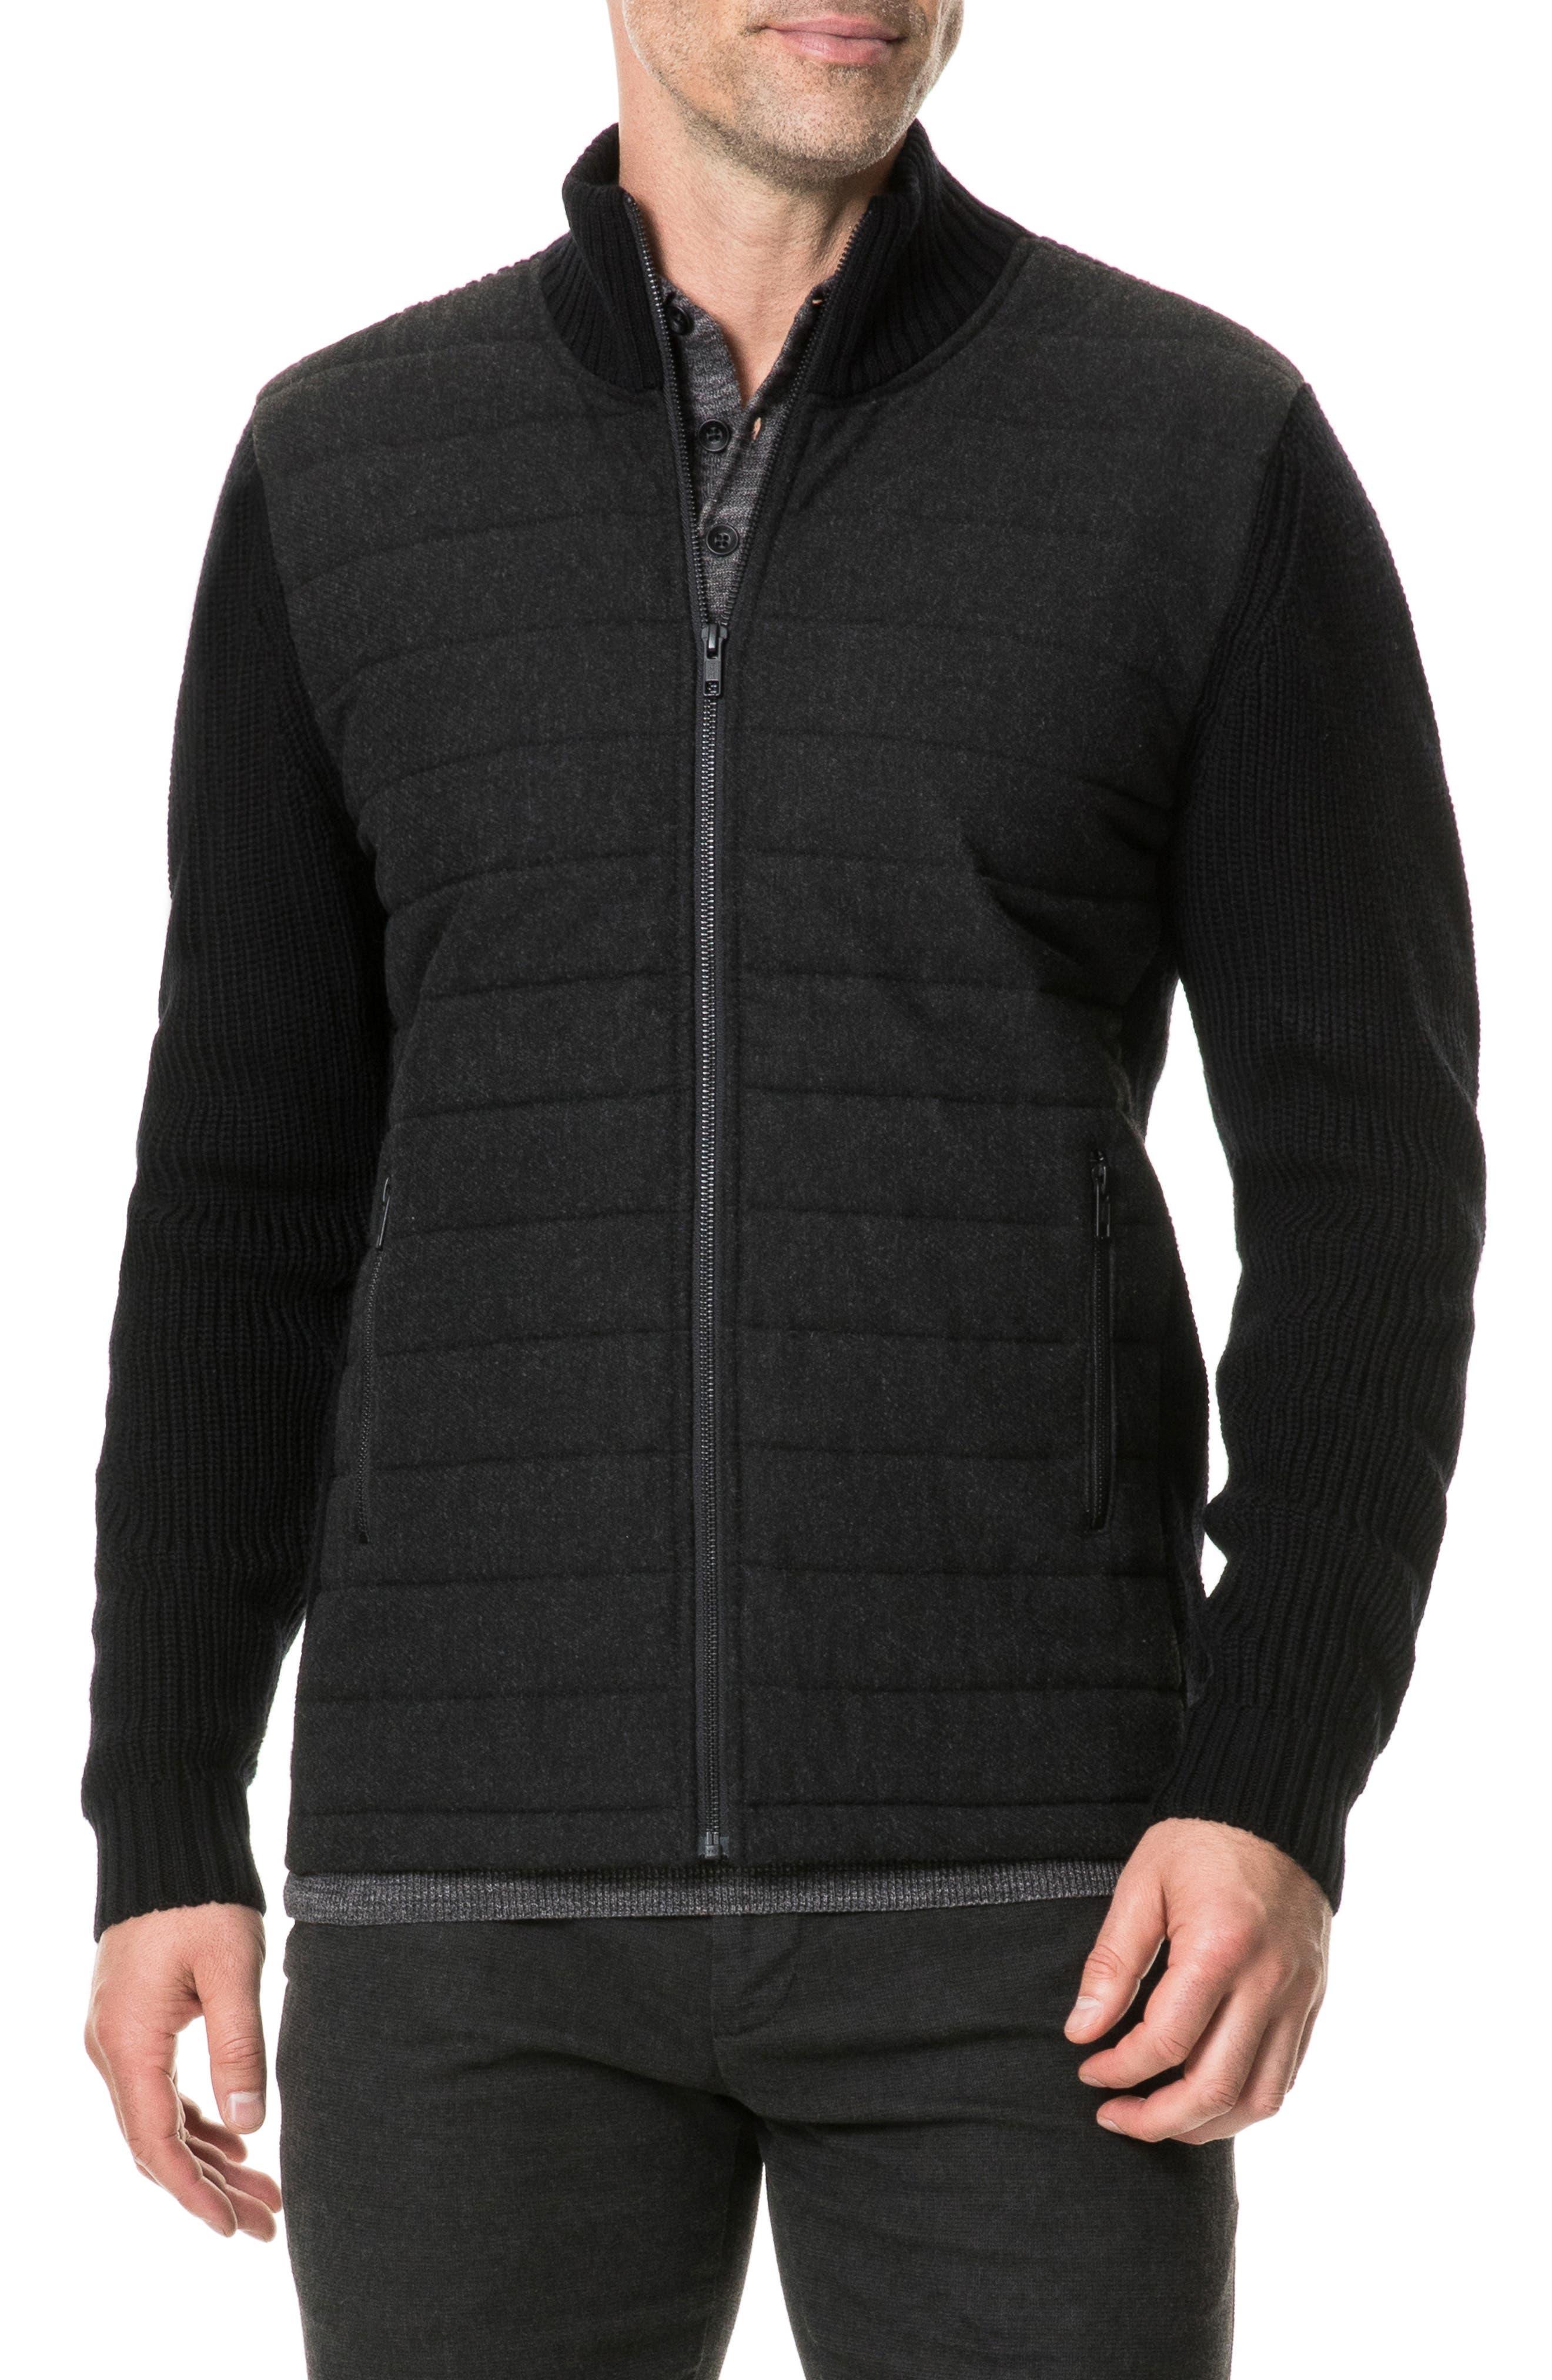 Greerton Regular Fit Zip Sweater,                             Main thumbnail 1, color,                             ONYX